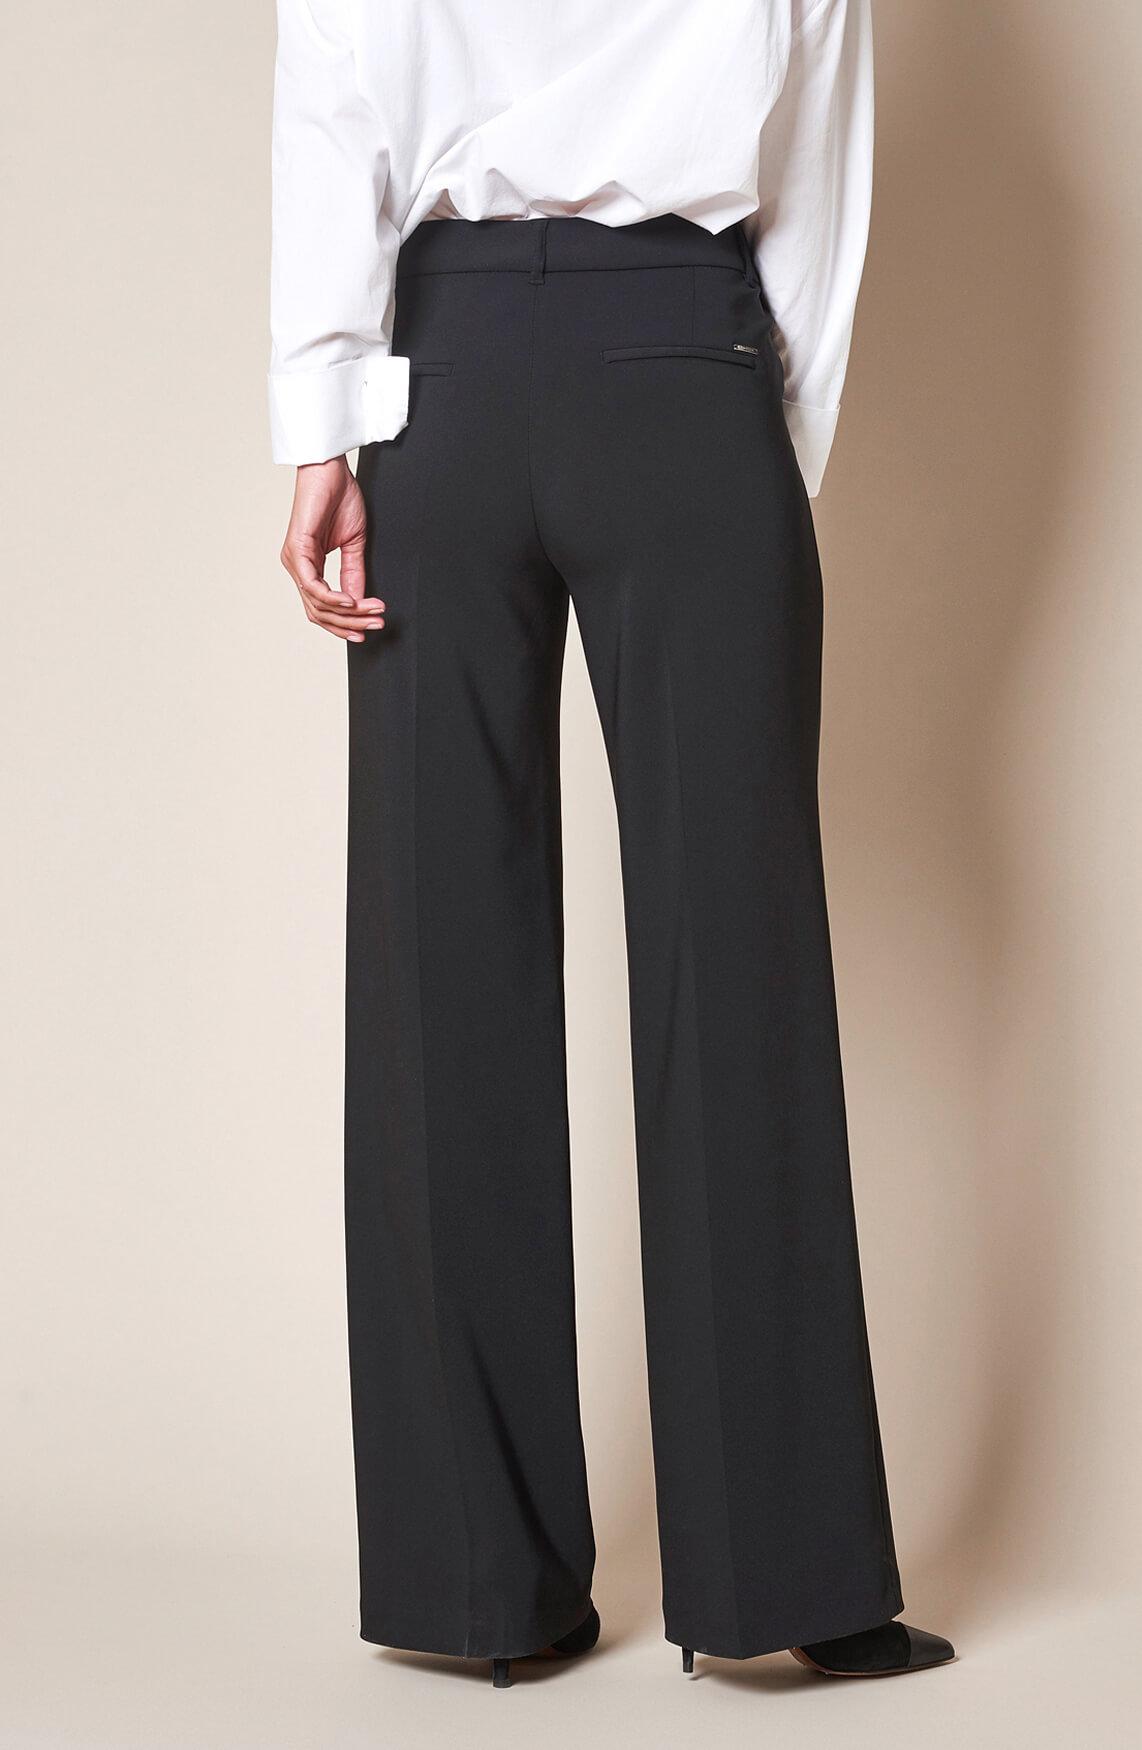 Rosner Dames L32 Mara pantalon zwart